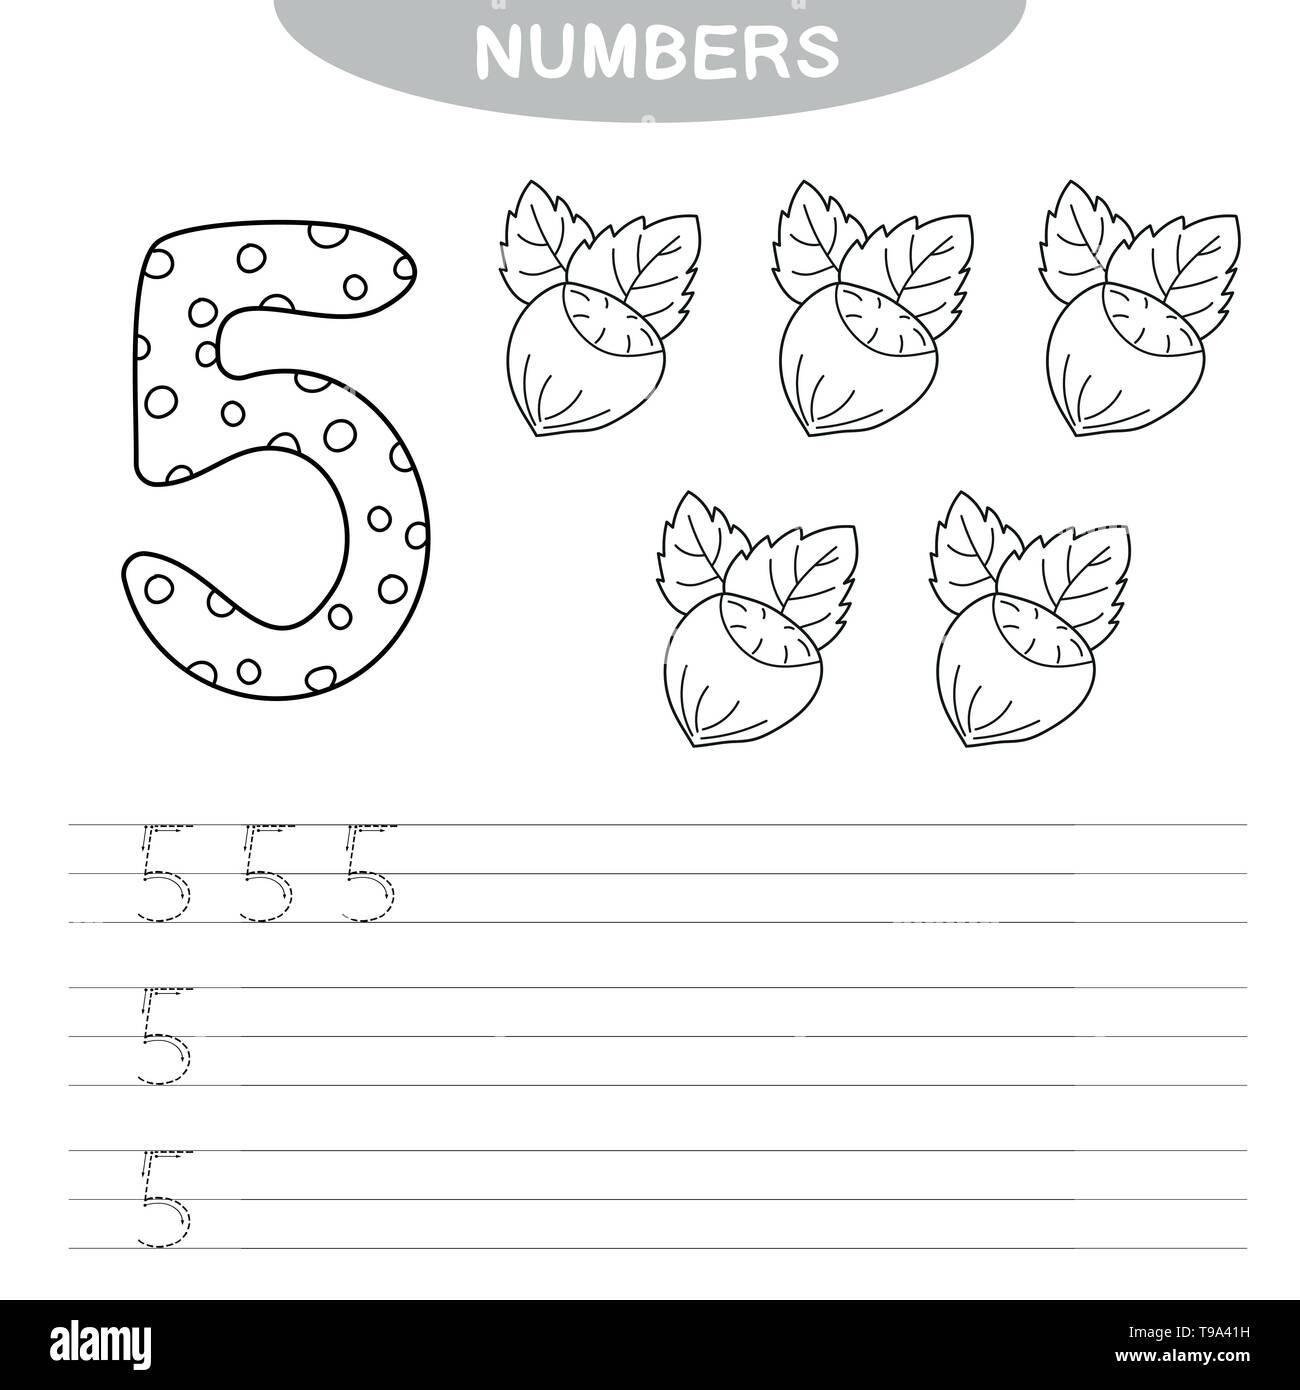 Number Writing Practice Worksheets For Kindergarten